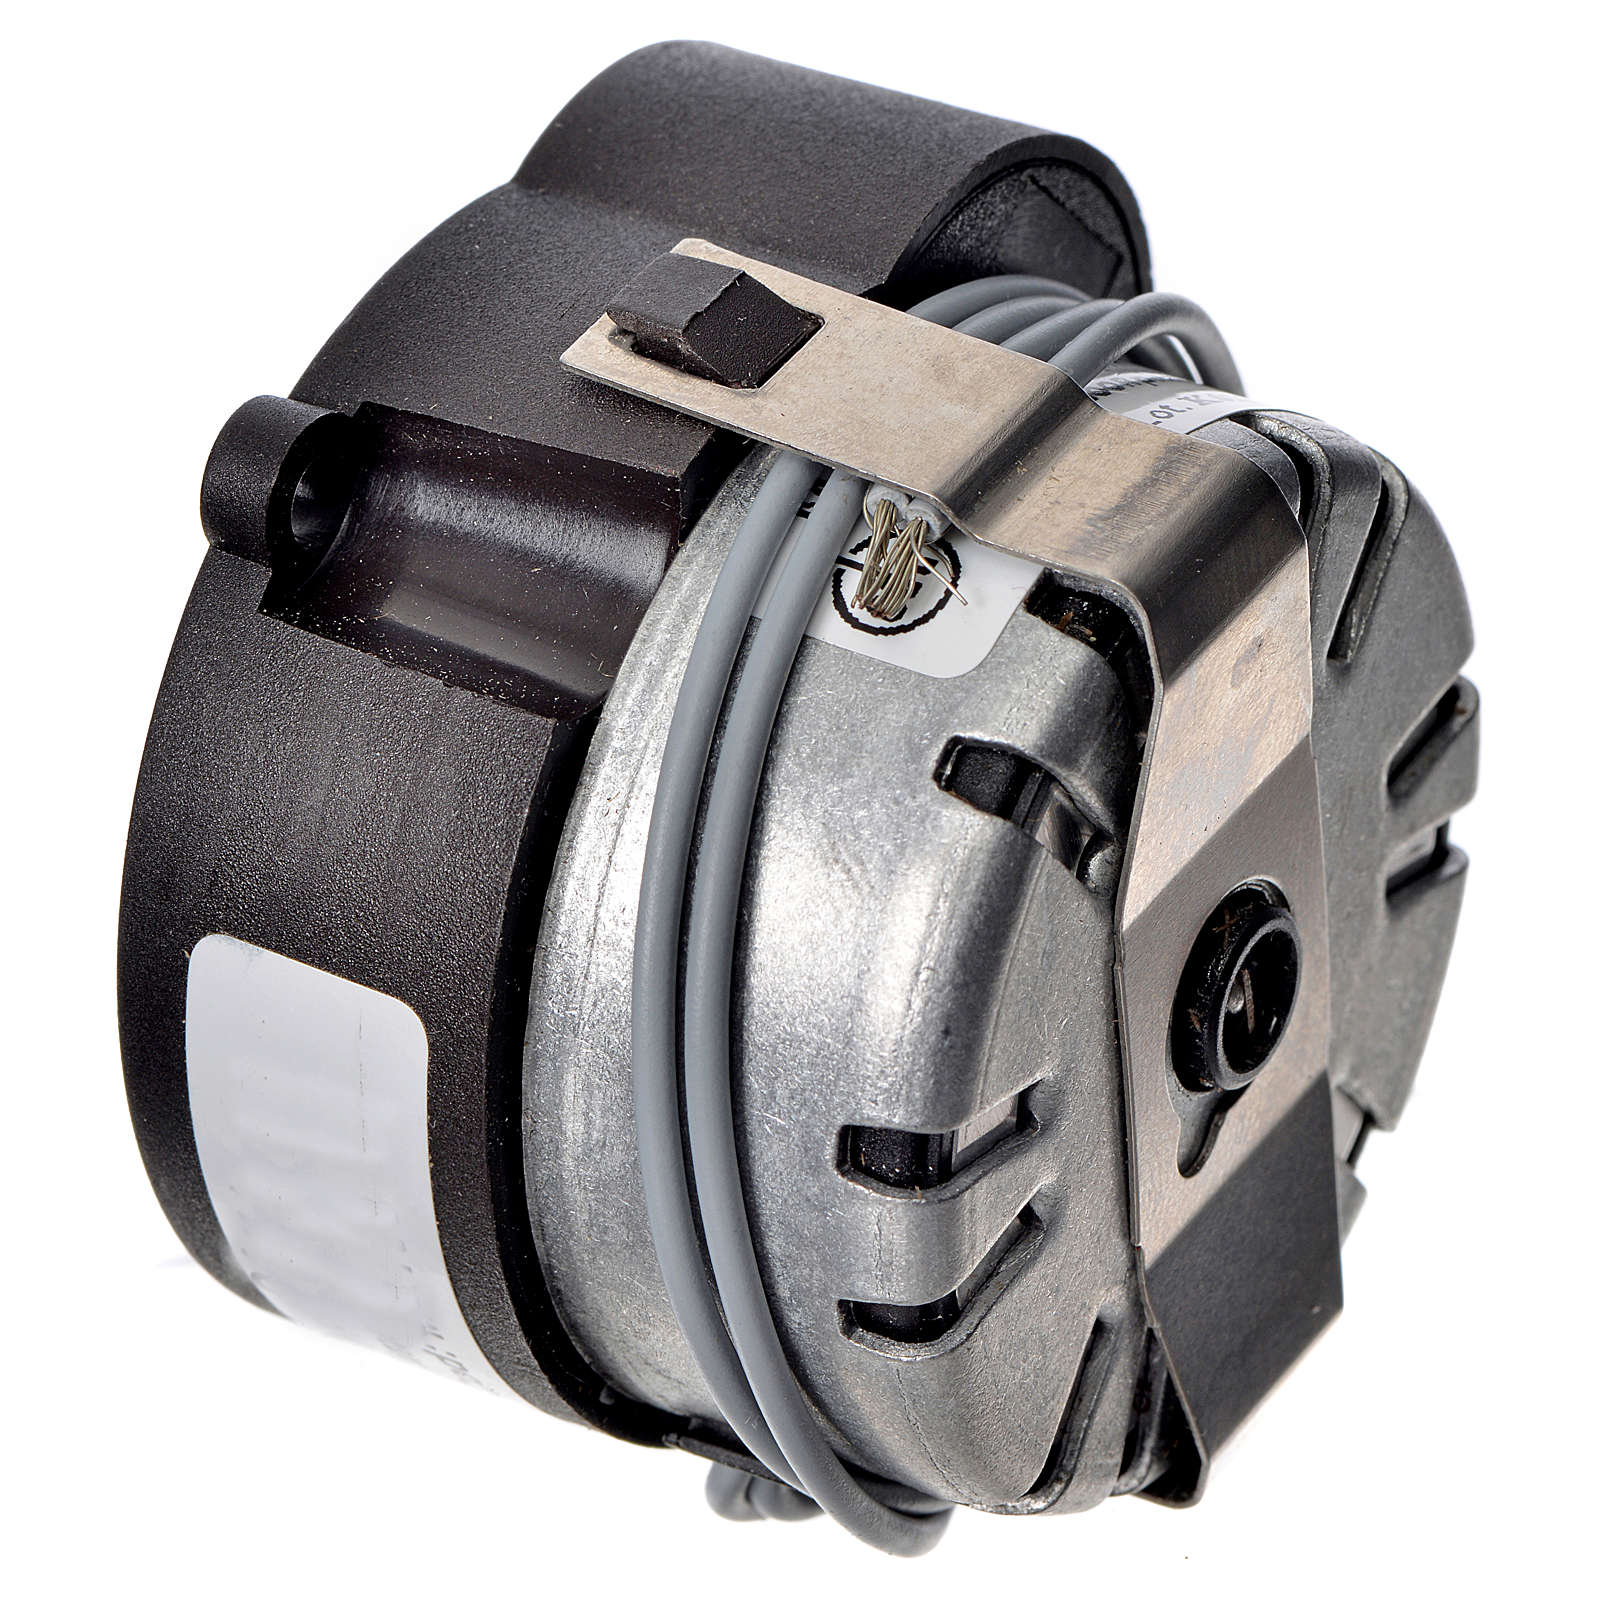 Motoriduttore presepe  MR giri/minuto 8 4